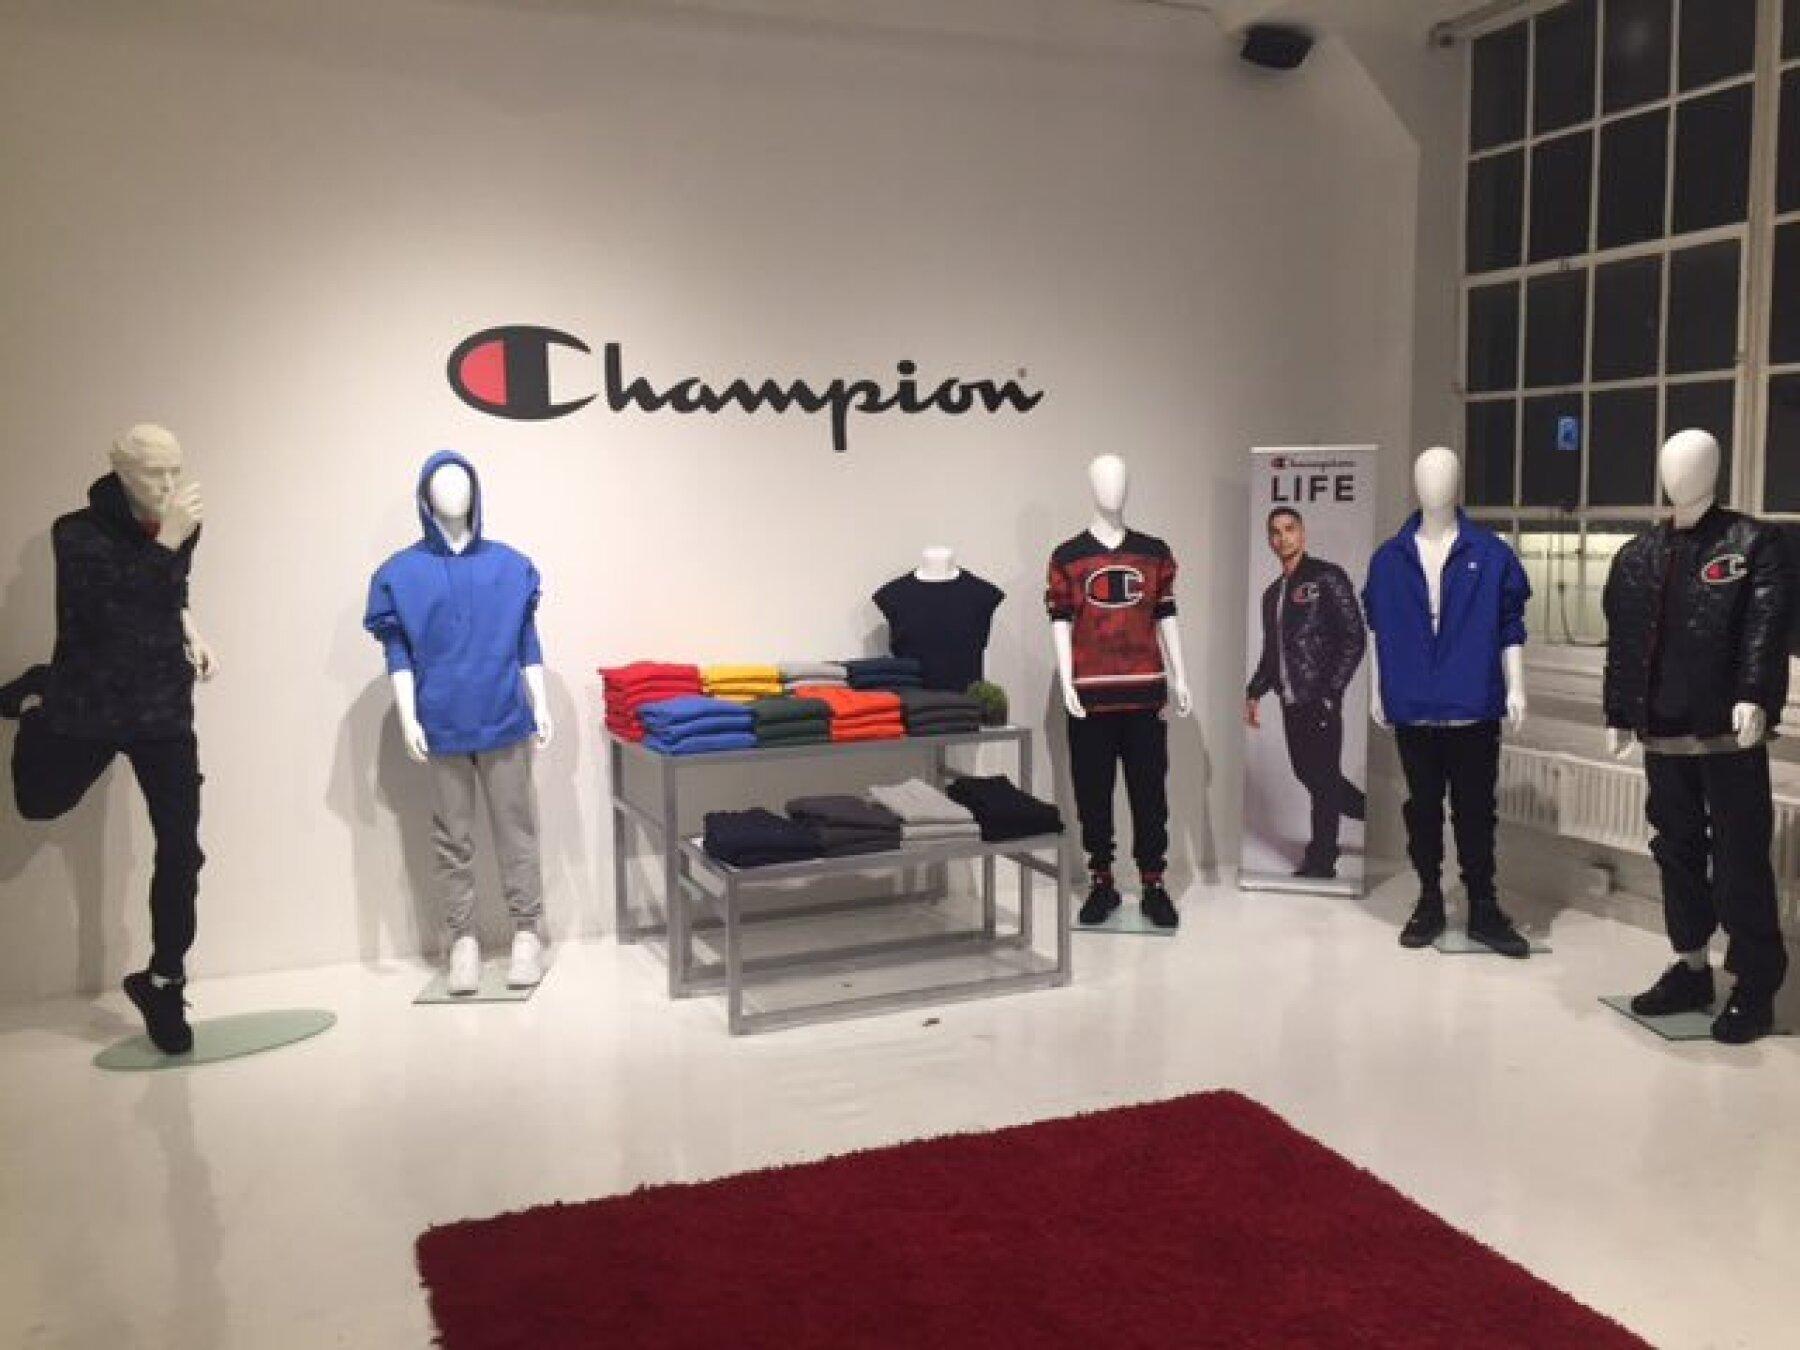 Champion boutique.jpg